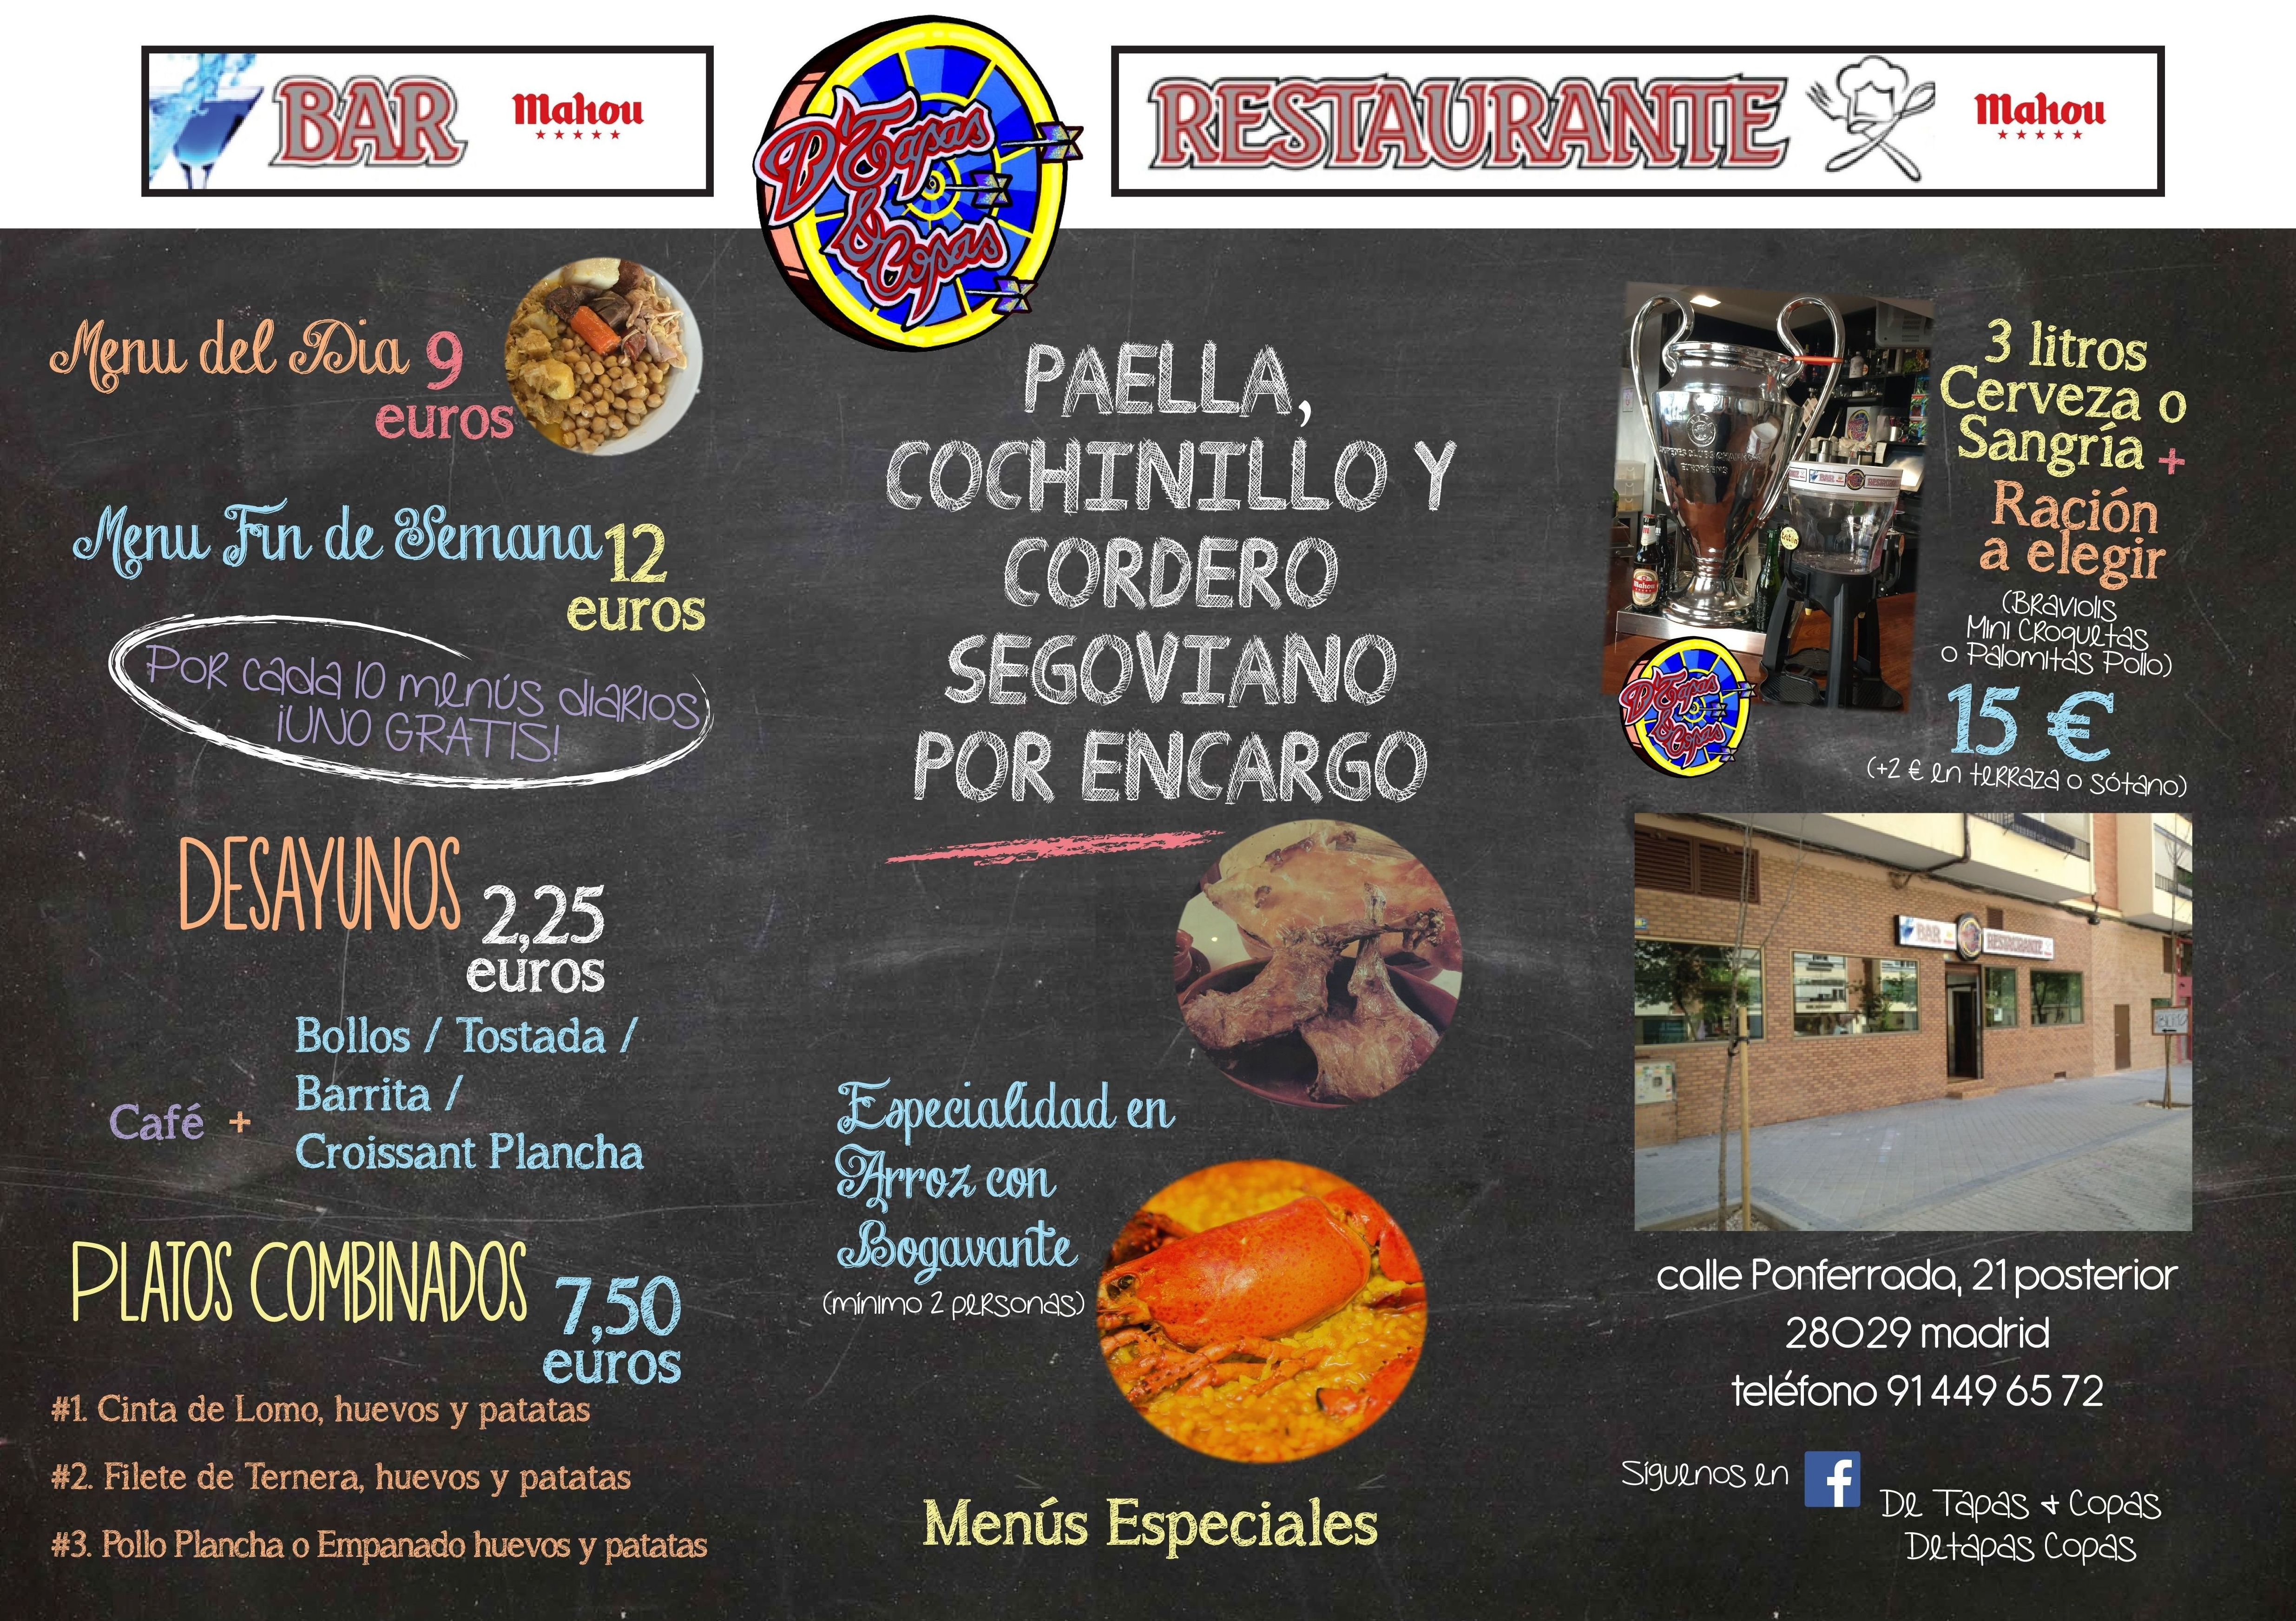 Restaurante D´Tapas & Copas